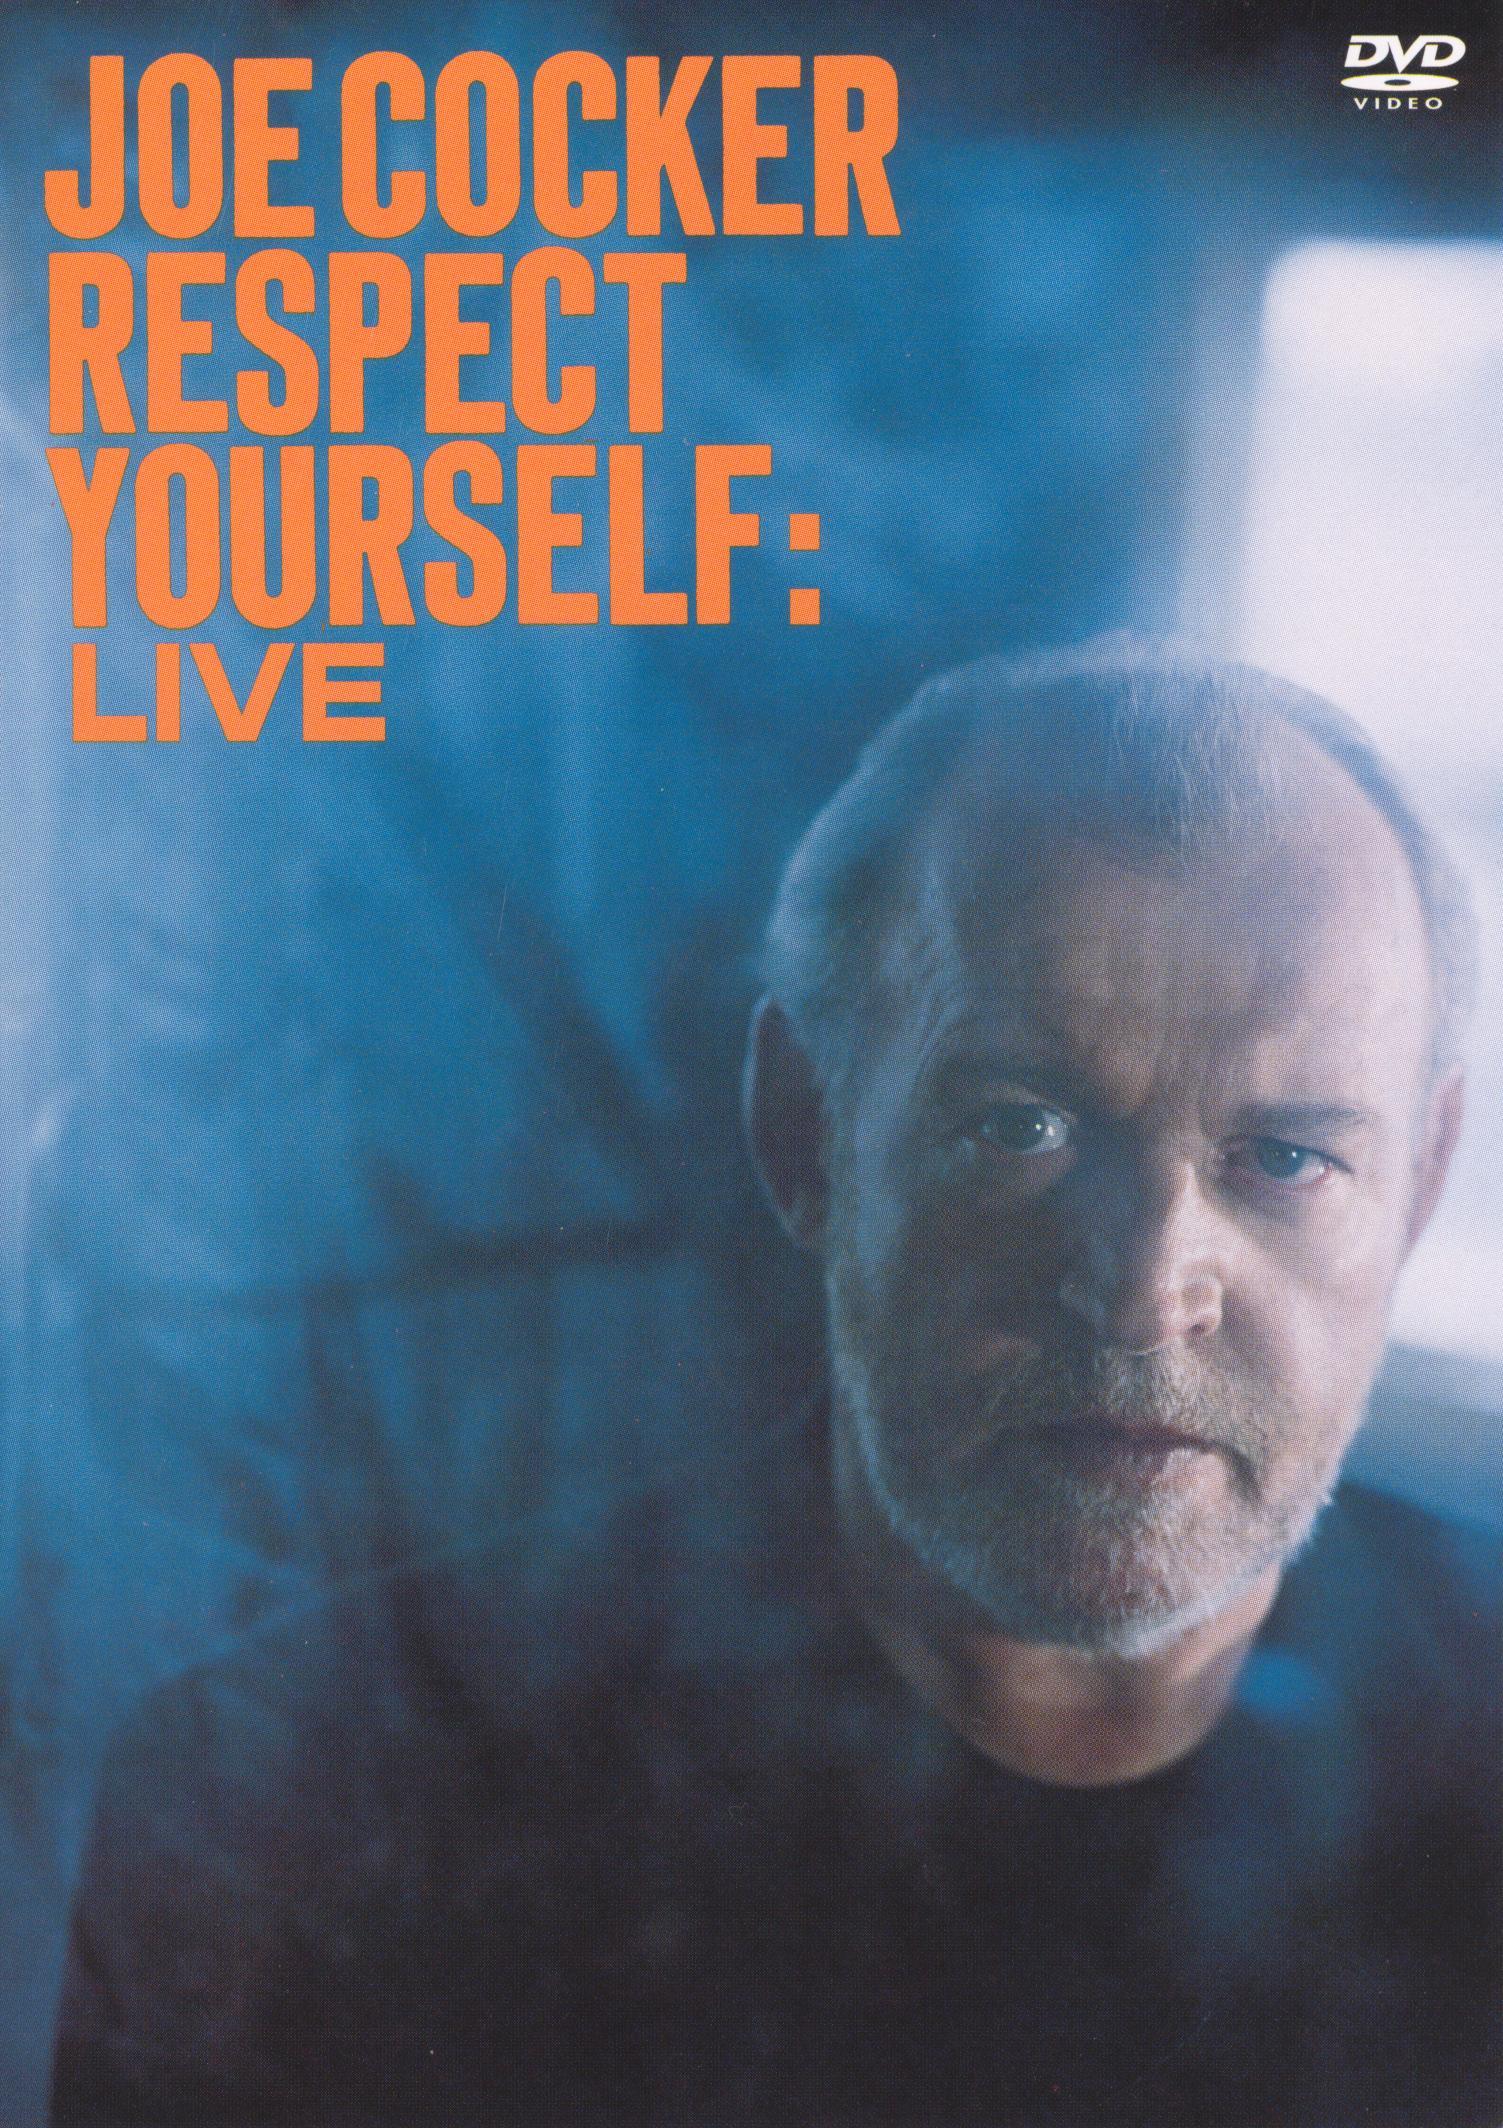 Joe Cocker: Respect Yourself Live